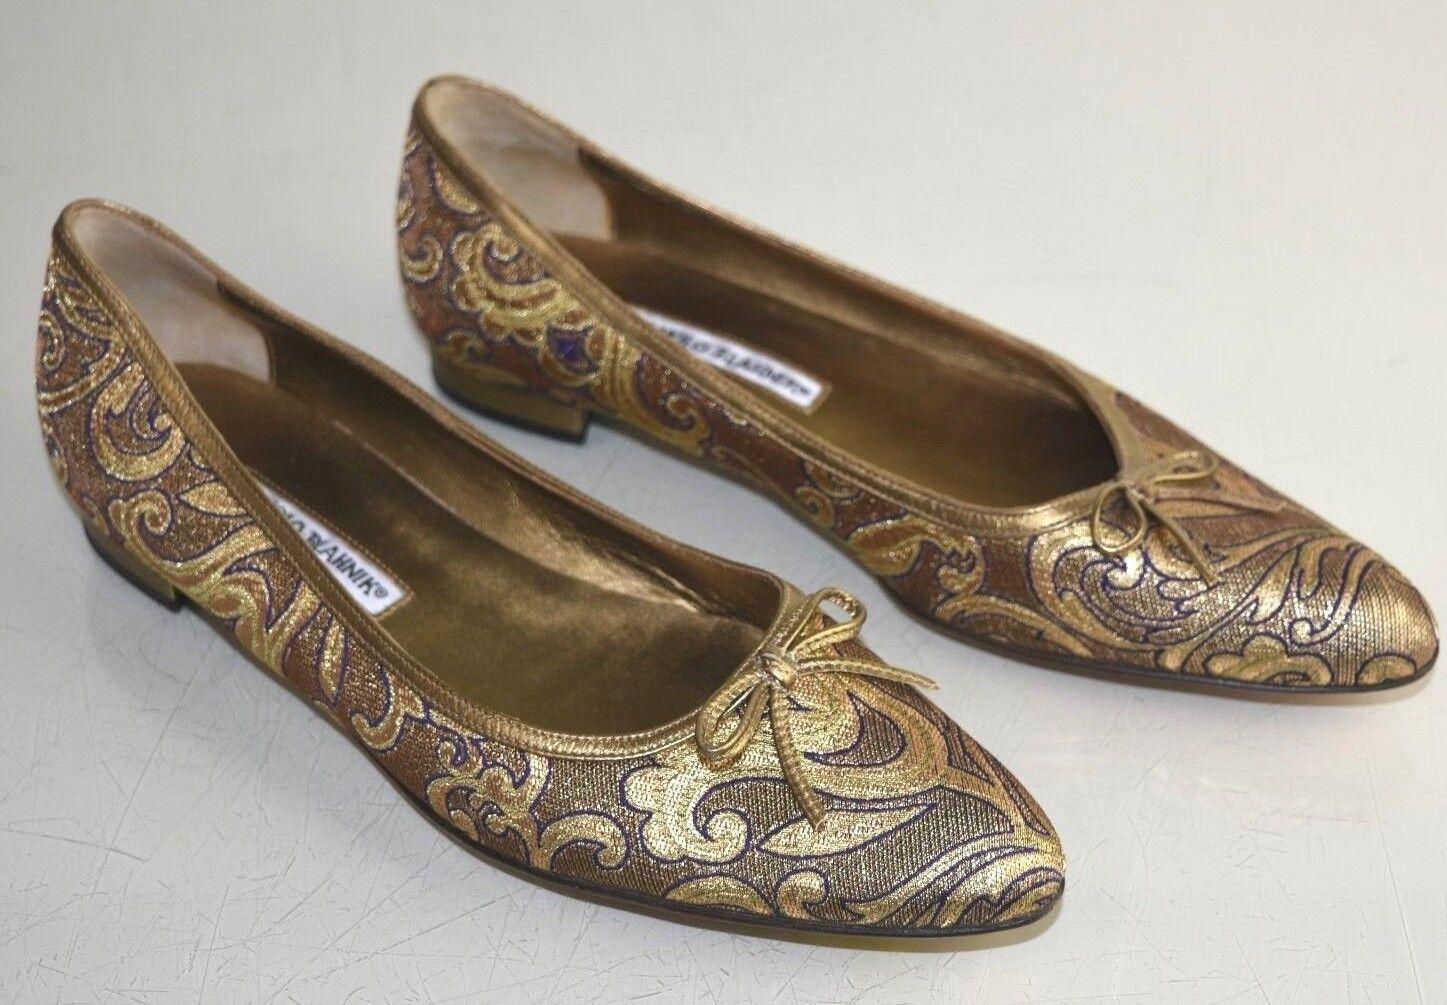 Neuf Manolo Blahnik Plats Cuir or Jacquard Nœud Plat Chaussures Violettes 38